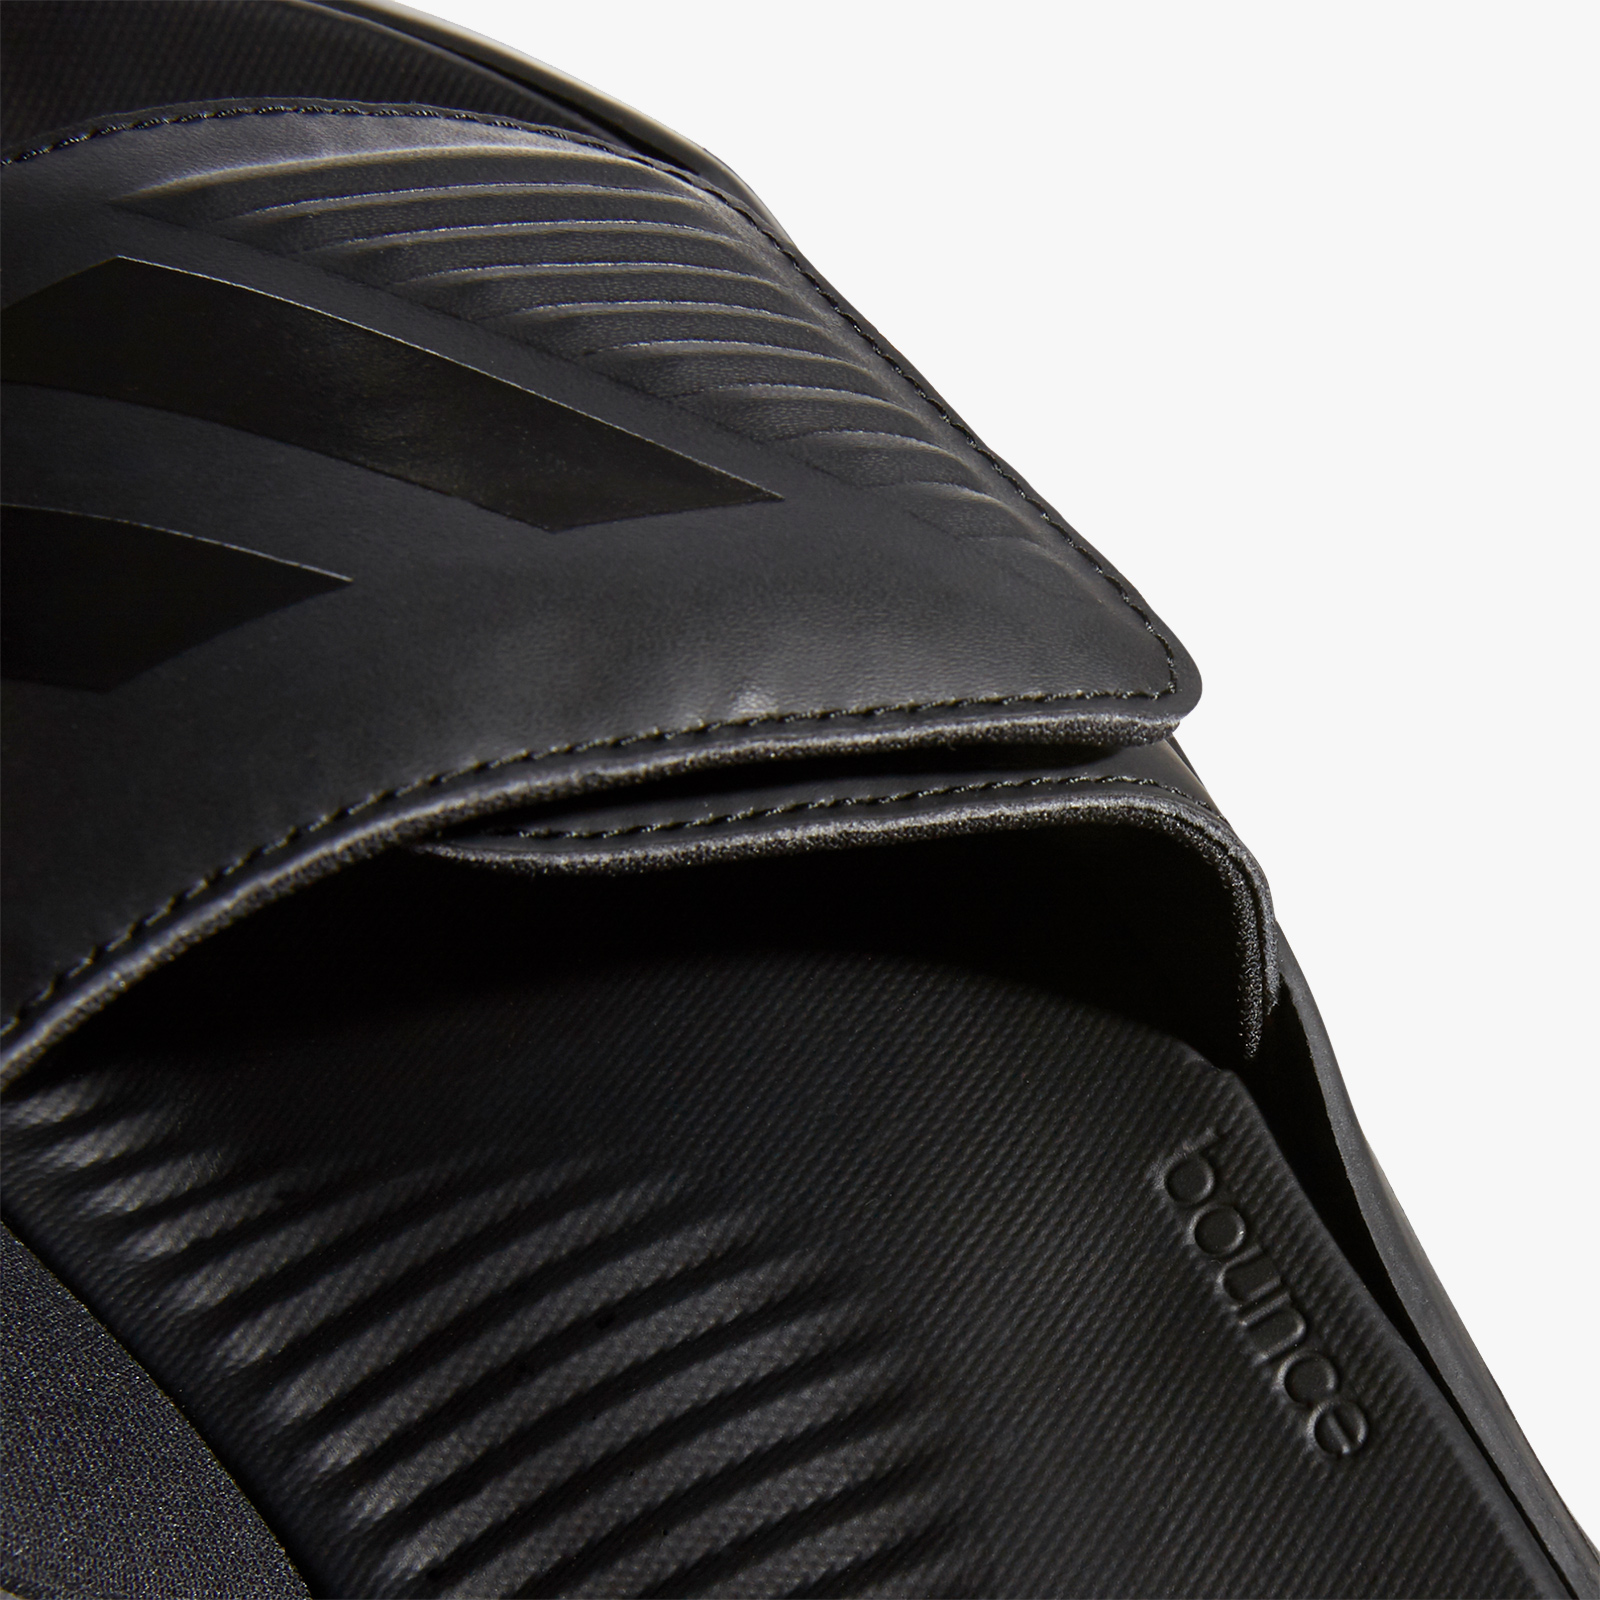 65248098e8f2e adidas Alphabounce Slide - B41720 - Sneakersnstuff